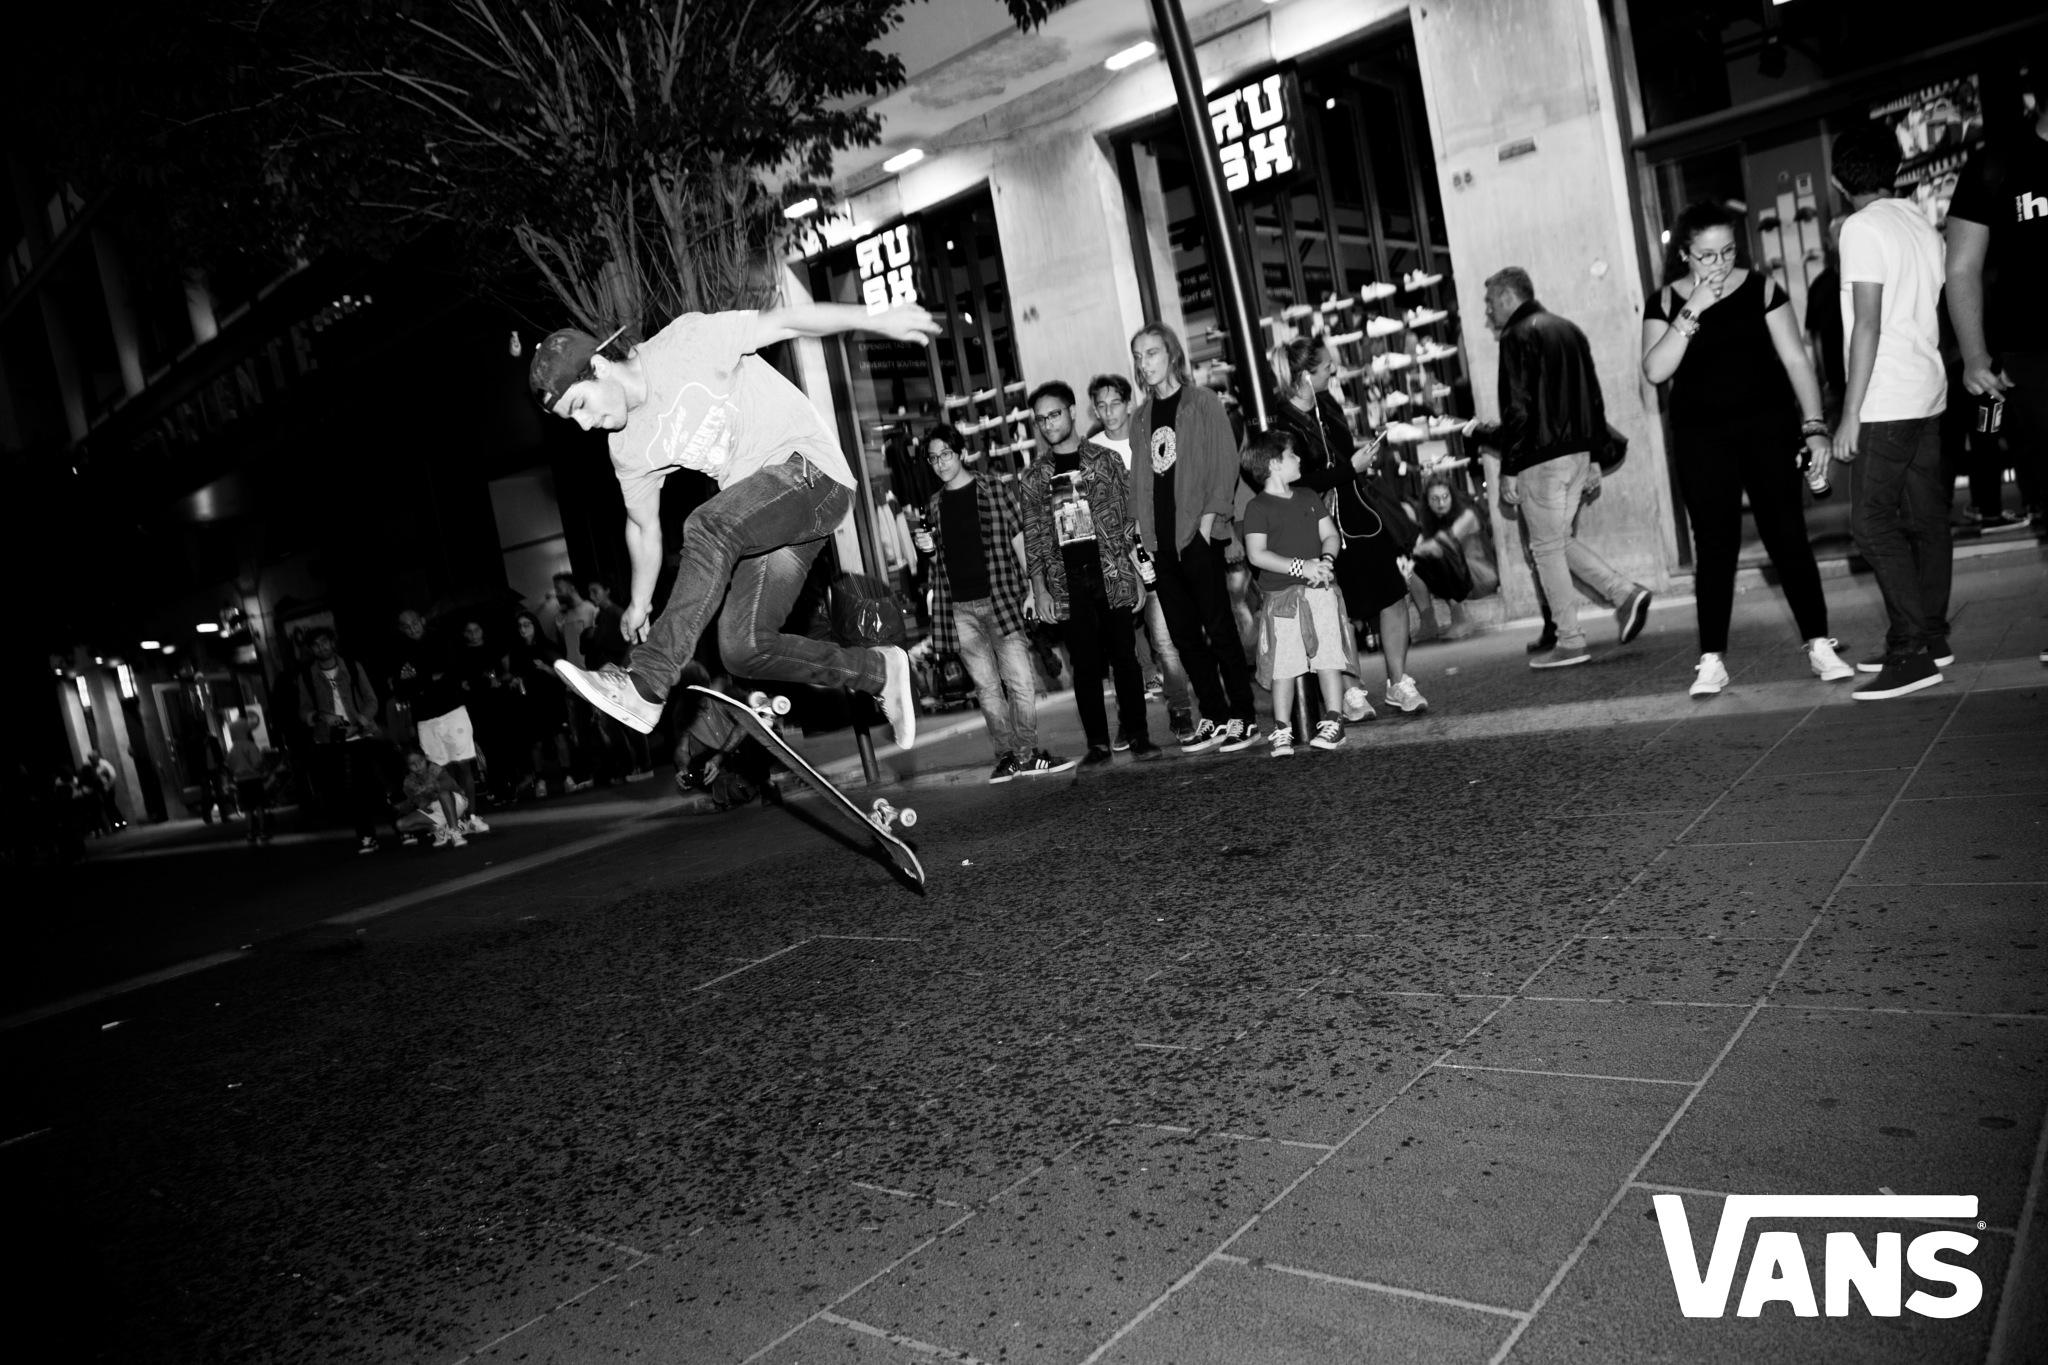 Jump  by DavideCiaramella